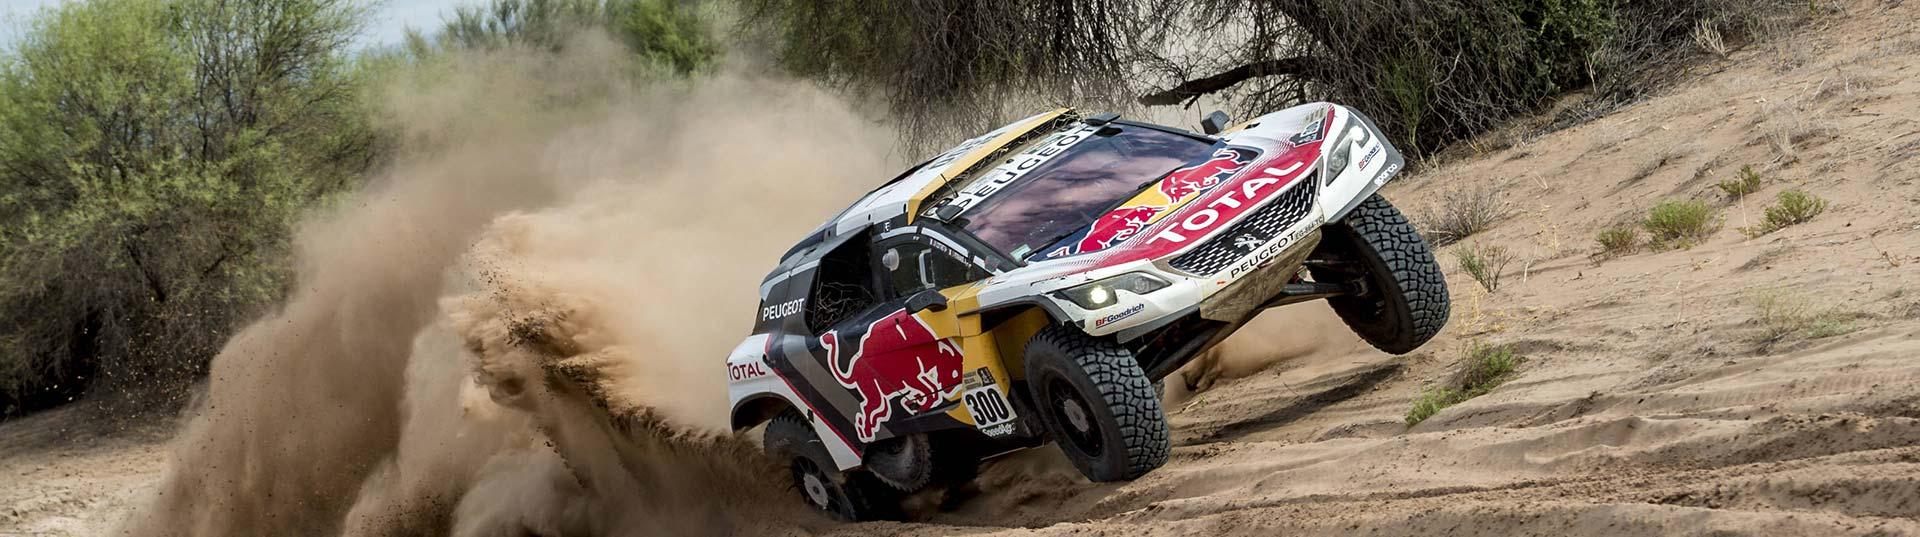 Stephane Peterhansel vence Dakar pela 13ª vez